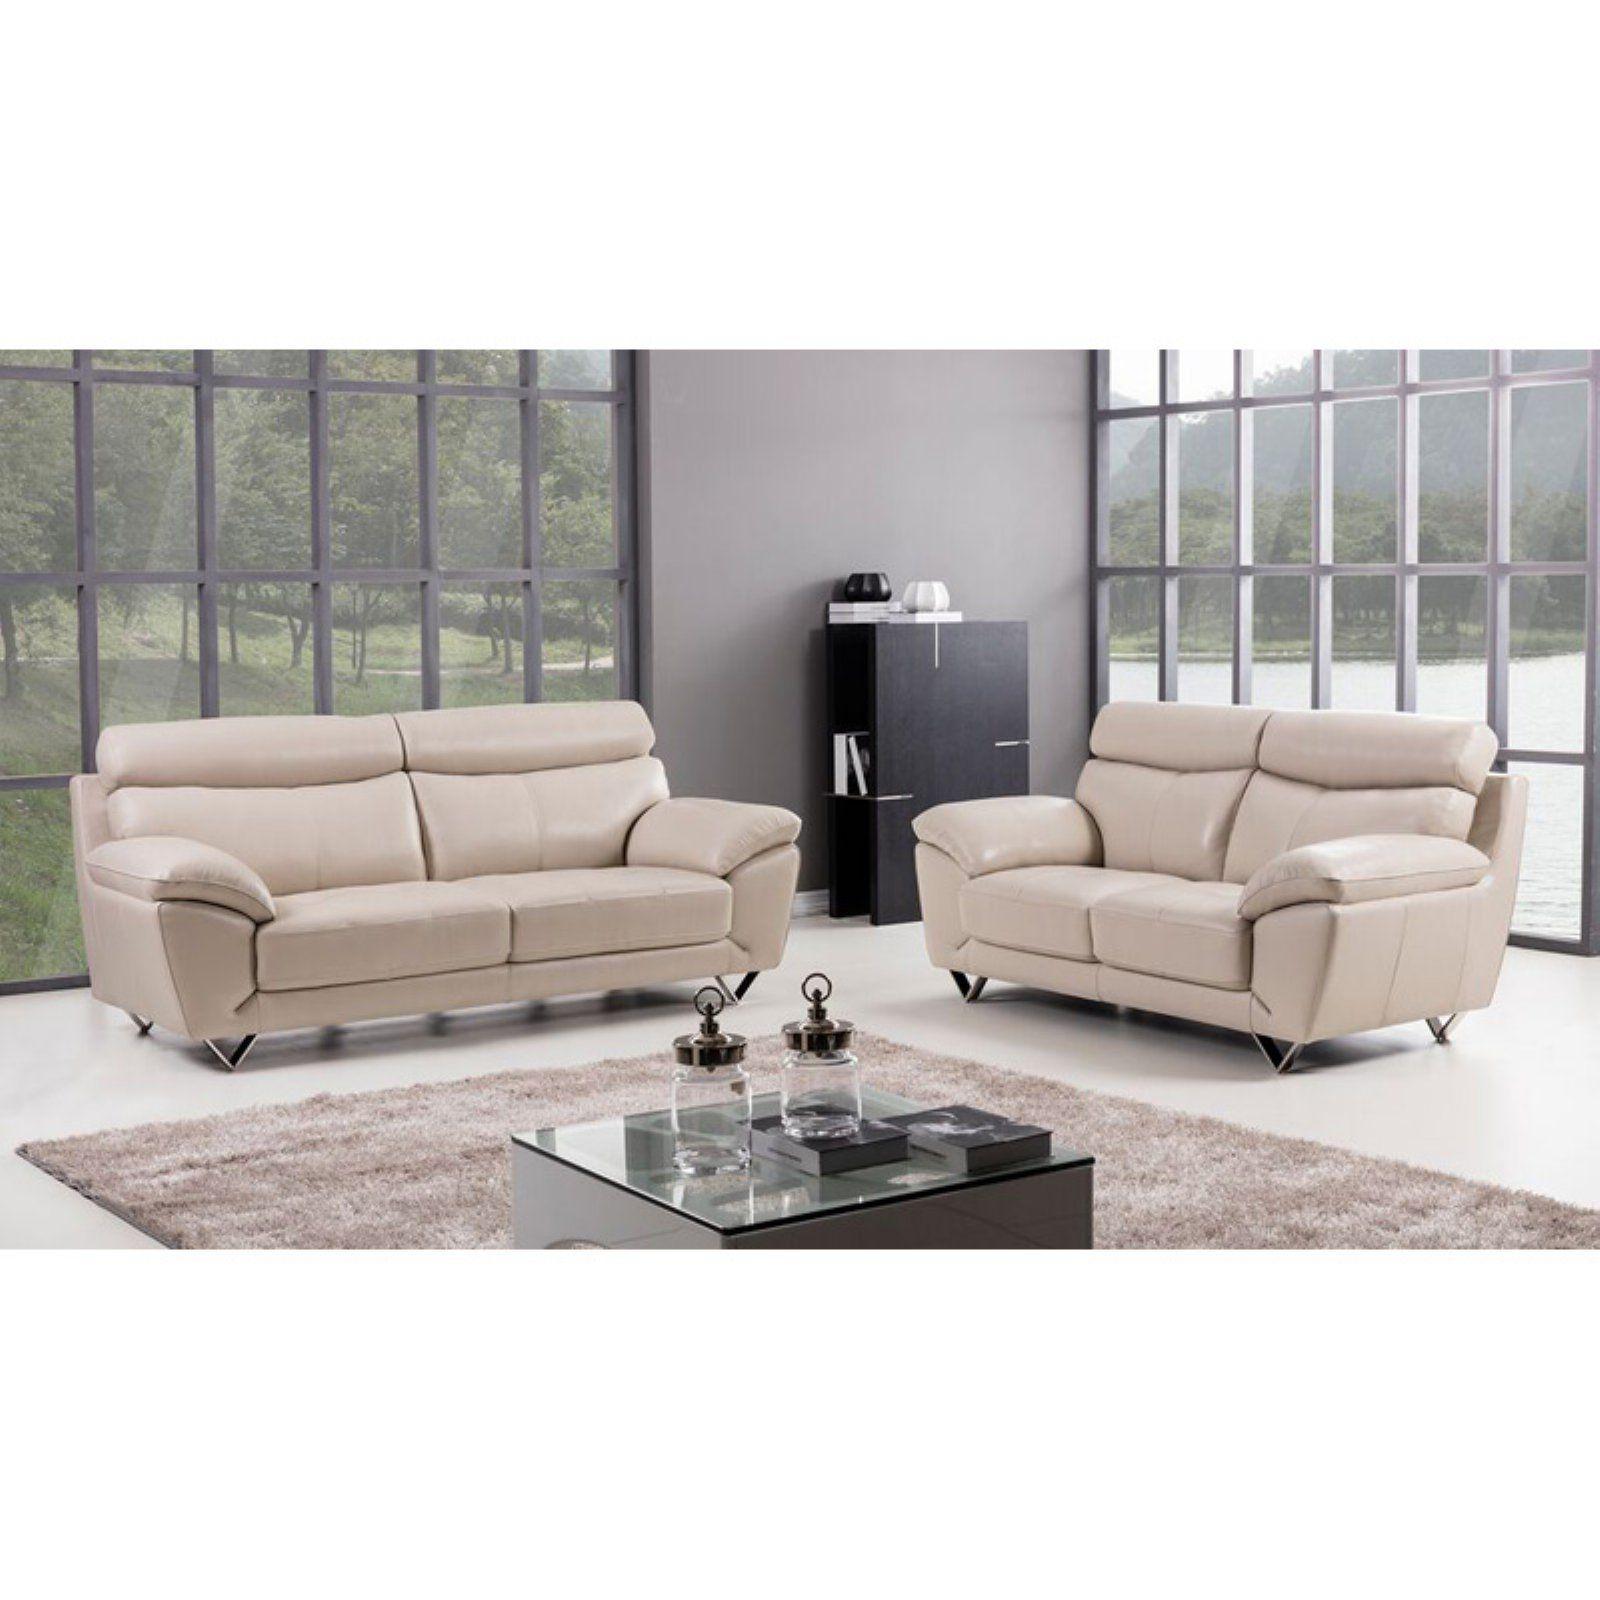 American Eagle Furniture Brighton Sofa With Plush Bustle